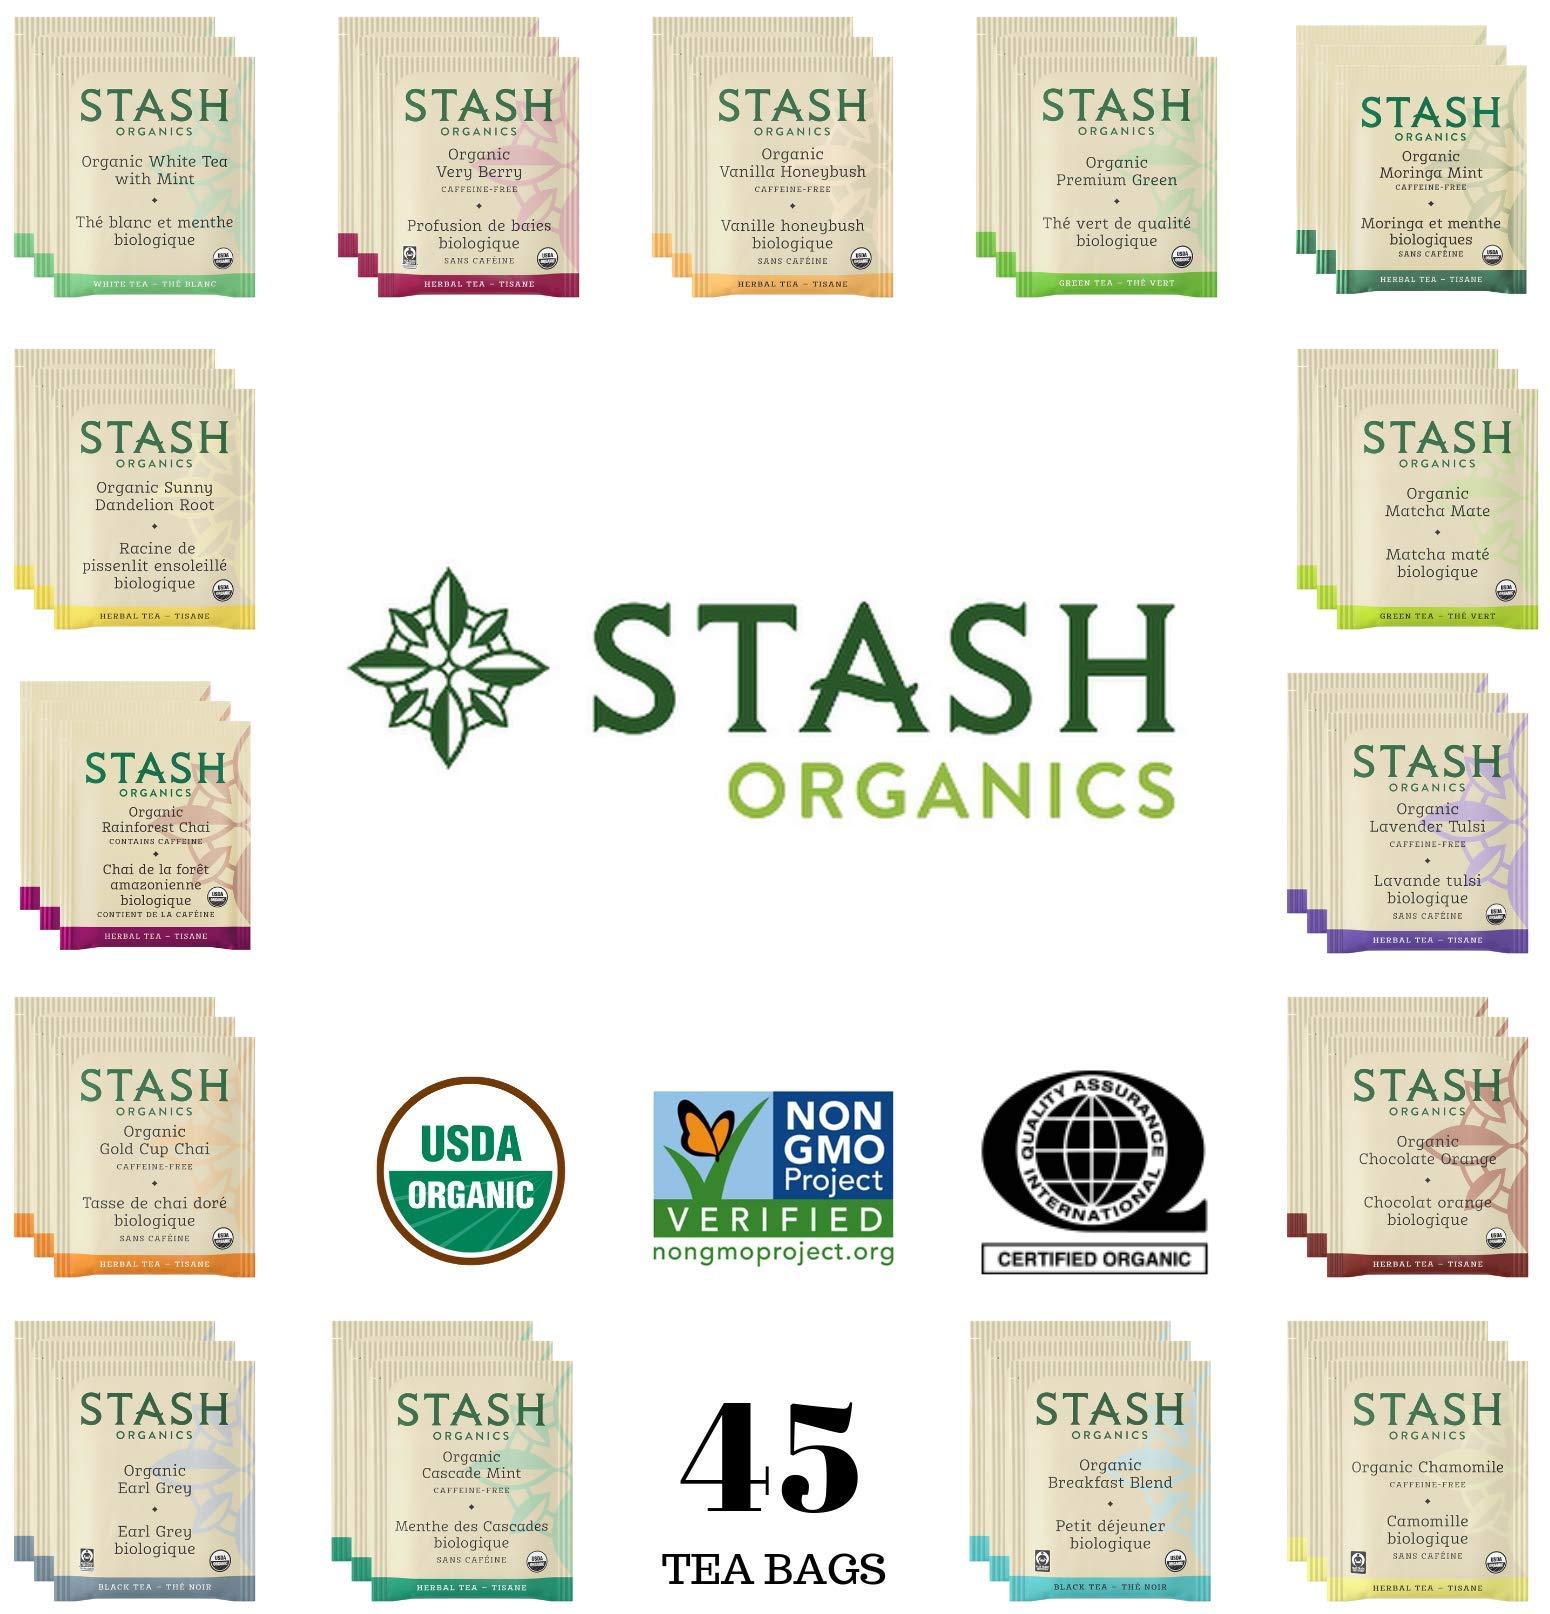 Stash Organic Tea Sampler - Assortment Variety Pack Gift Set - Black, White, Green & Herbal Tea Bags - 45 Count, 15 Flavors - /w Eco-Friendly Cotton Bag by Stash